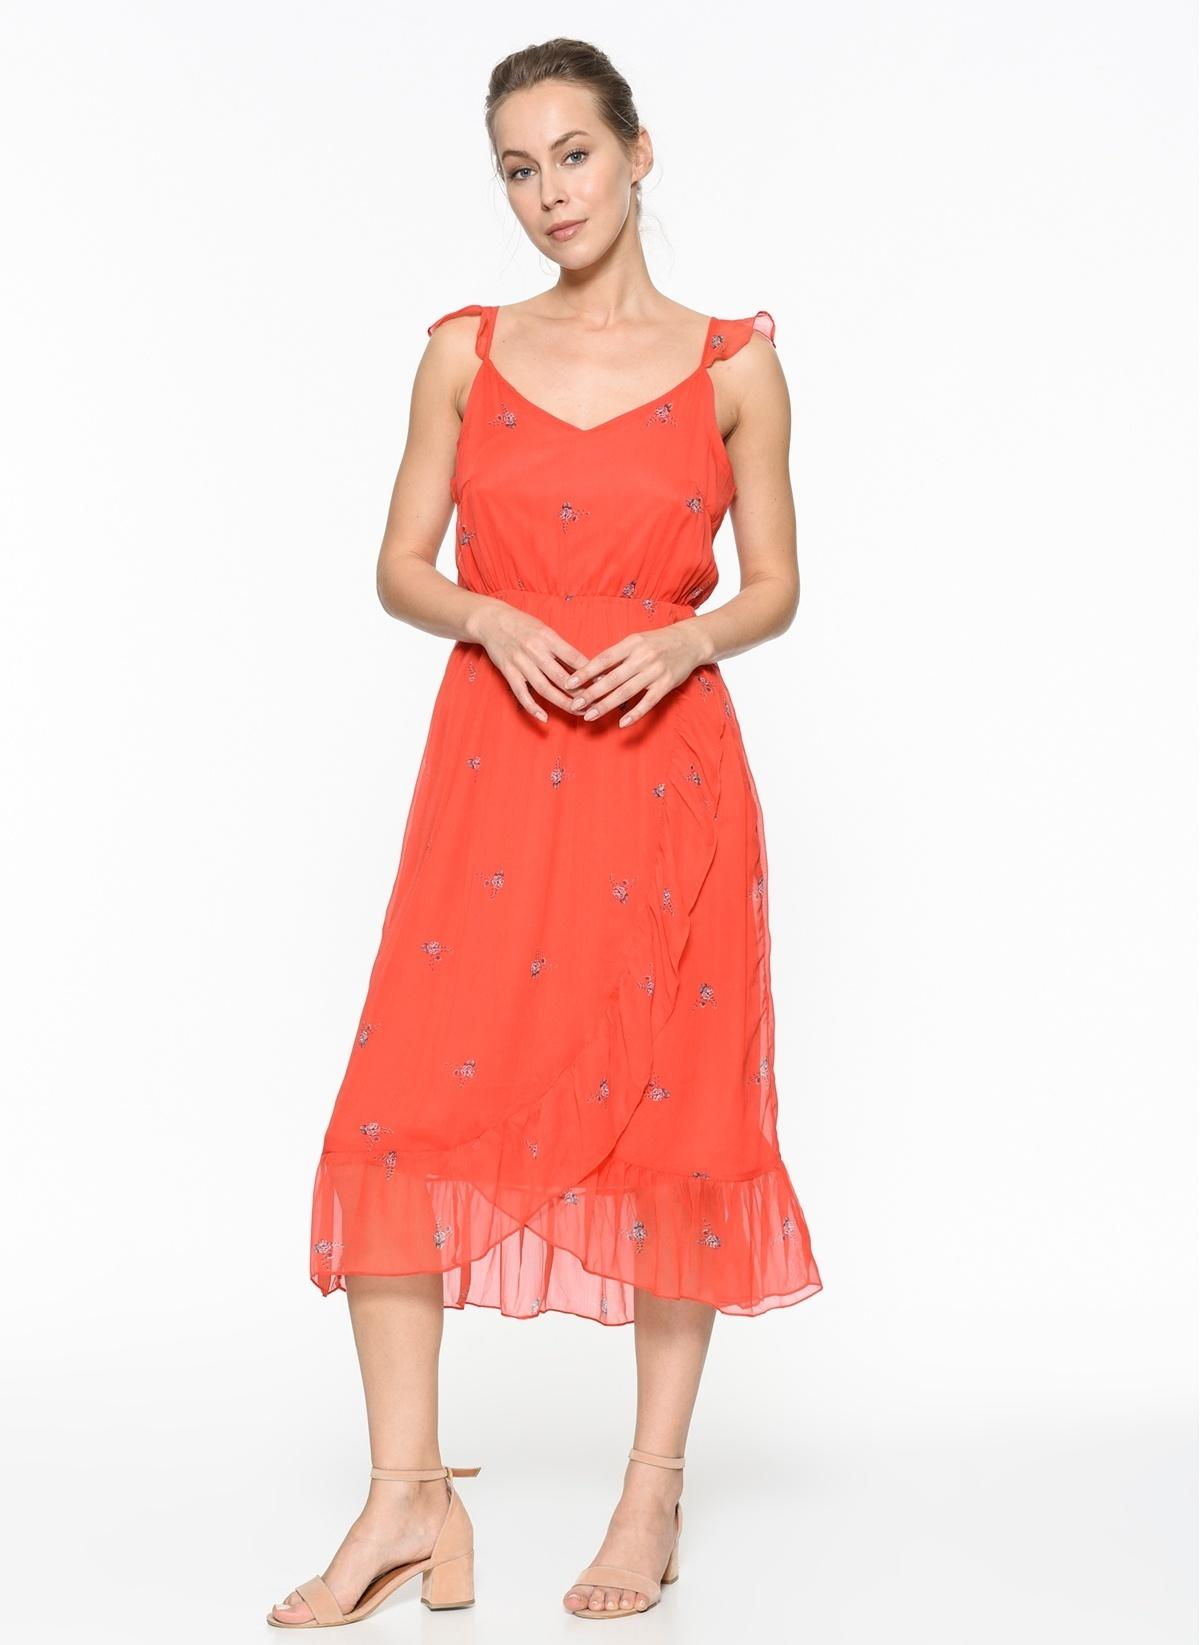 Vero Moda Askılı Midi Şifon Elbise 10198470 Vmdanni Singlet Calf Dress – 79.9 TL